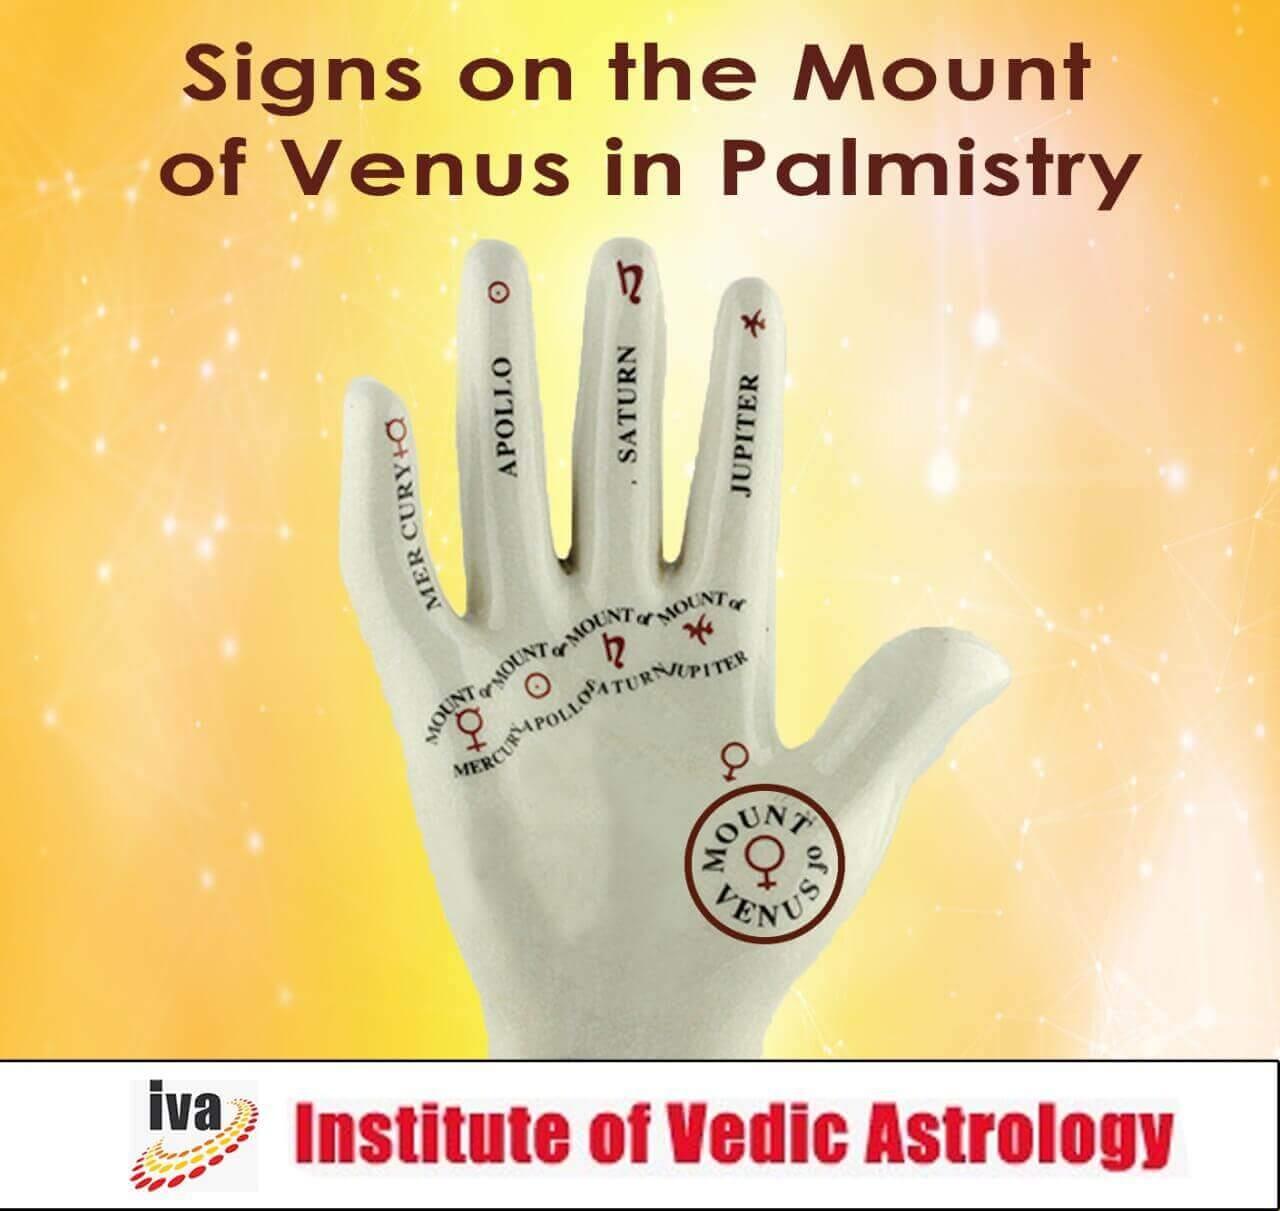 Signs on mount of Venus palmistry